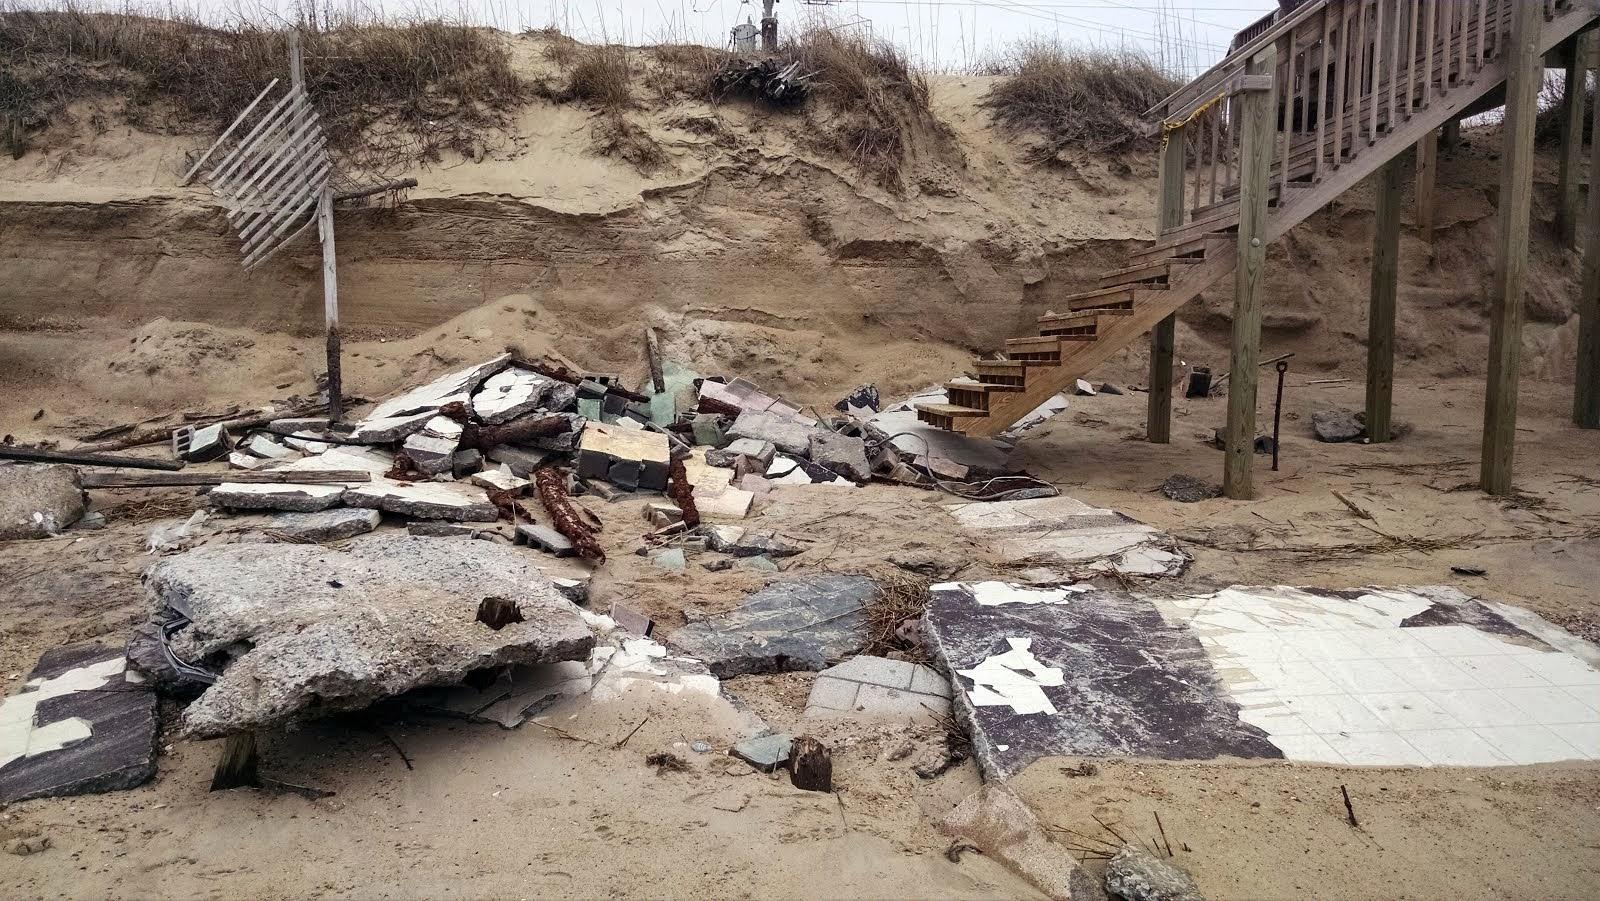 UPDATE - KITTY HAWK BEACH DEBRIS